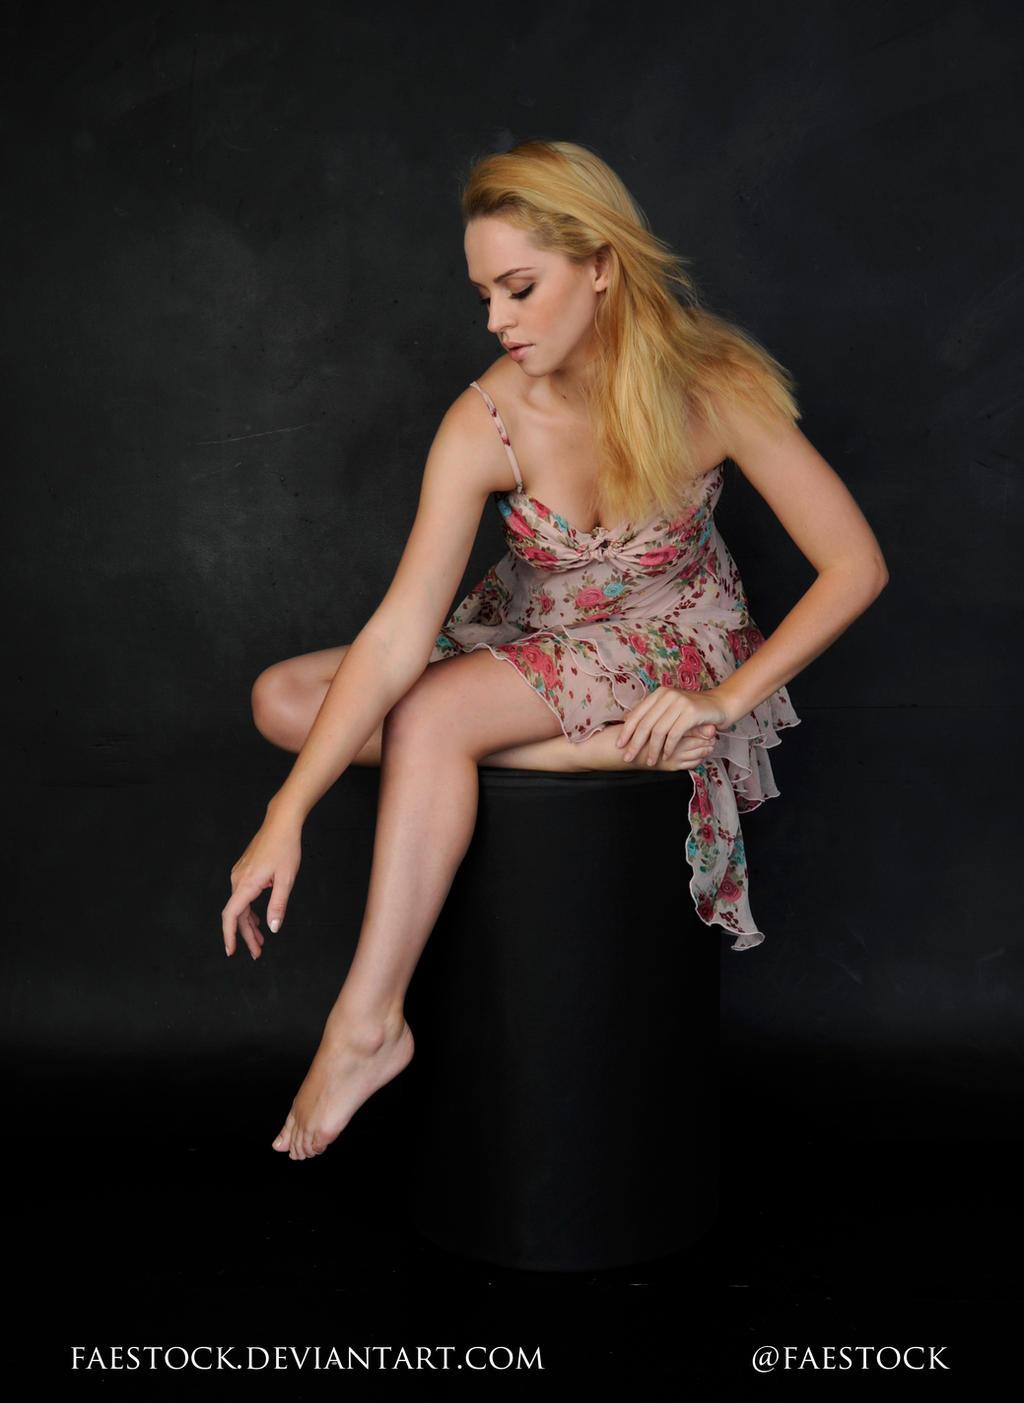 Laurel - Sitting pose reference 20 by faestock on DeviantArt